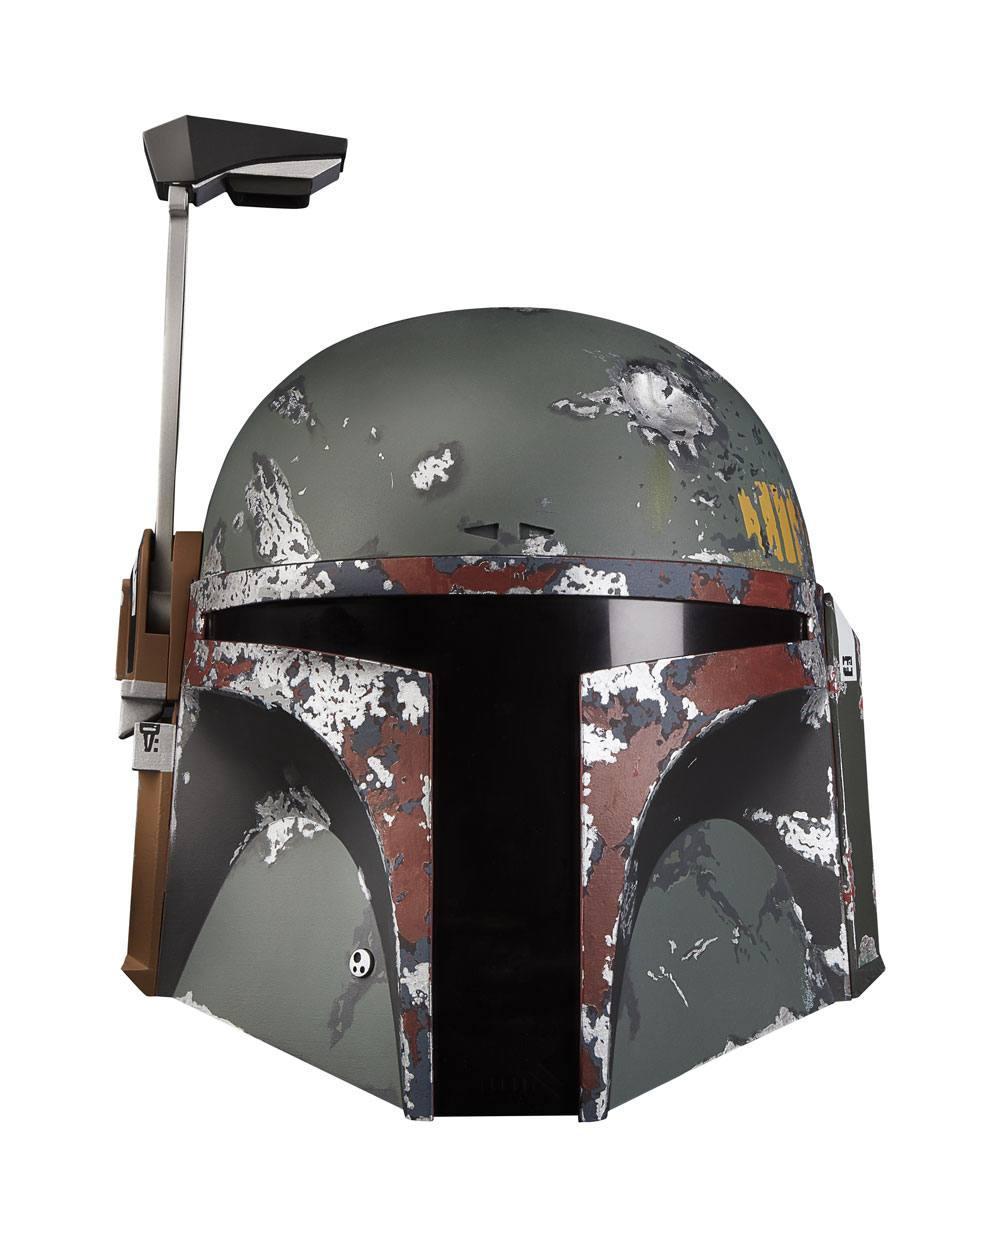 Star wars black series casque electronique premium boba fett 1